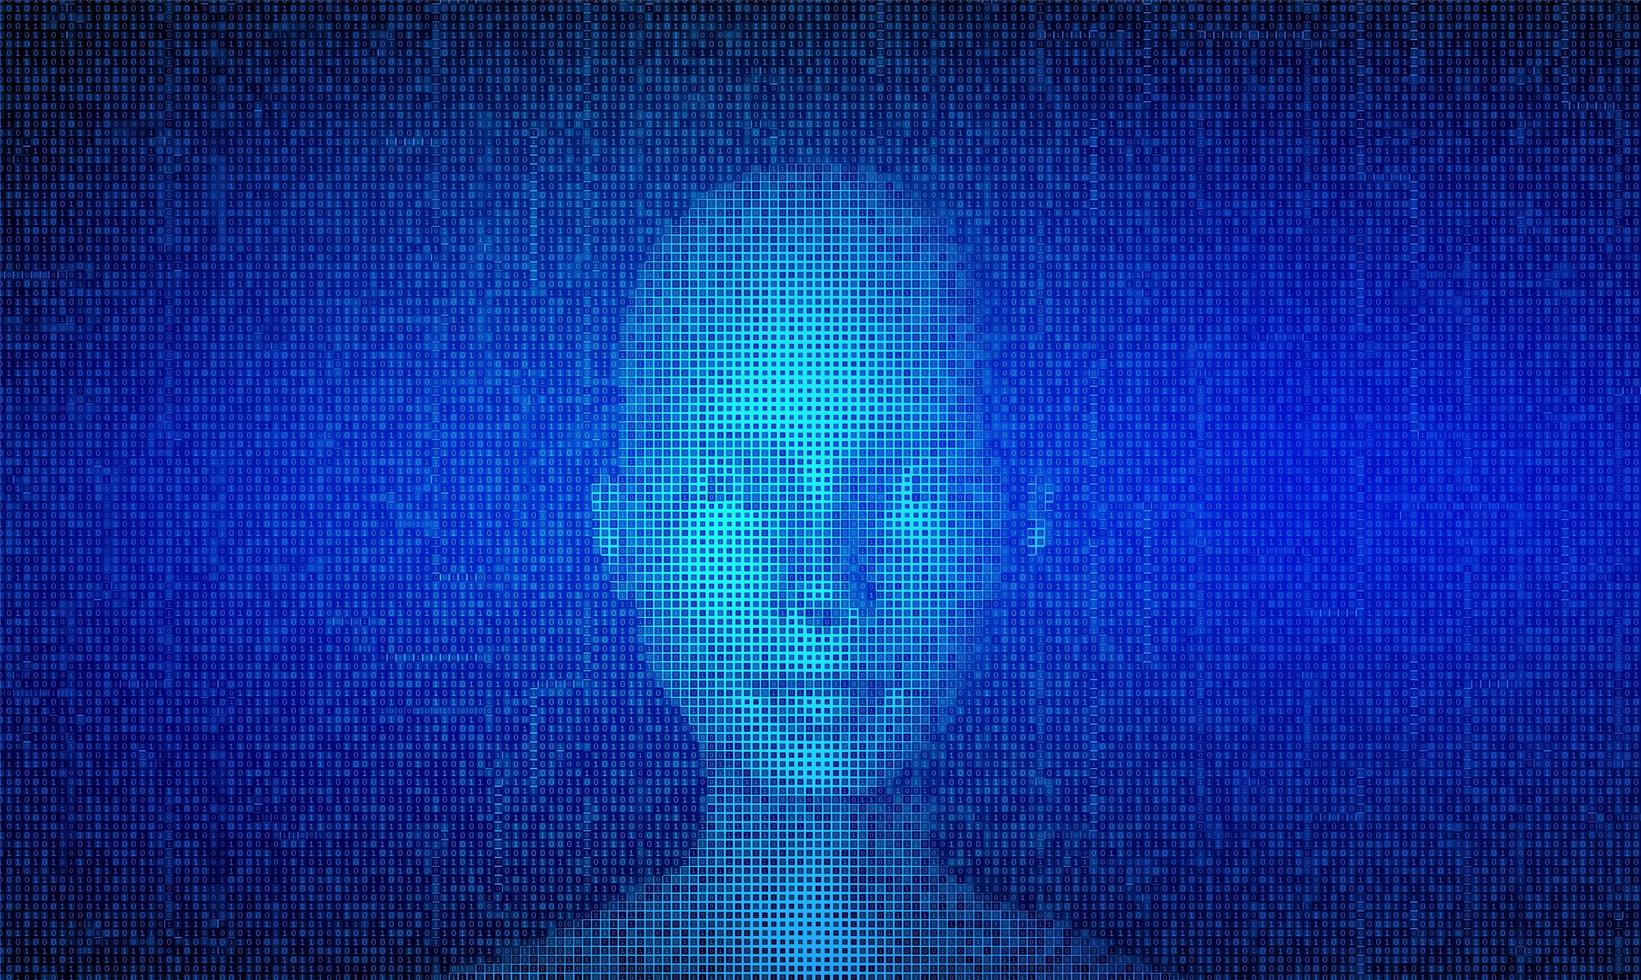 kunstmatige intelligentie concept futuristische banner vector